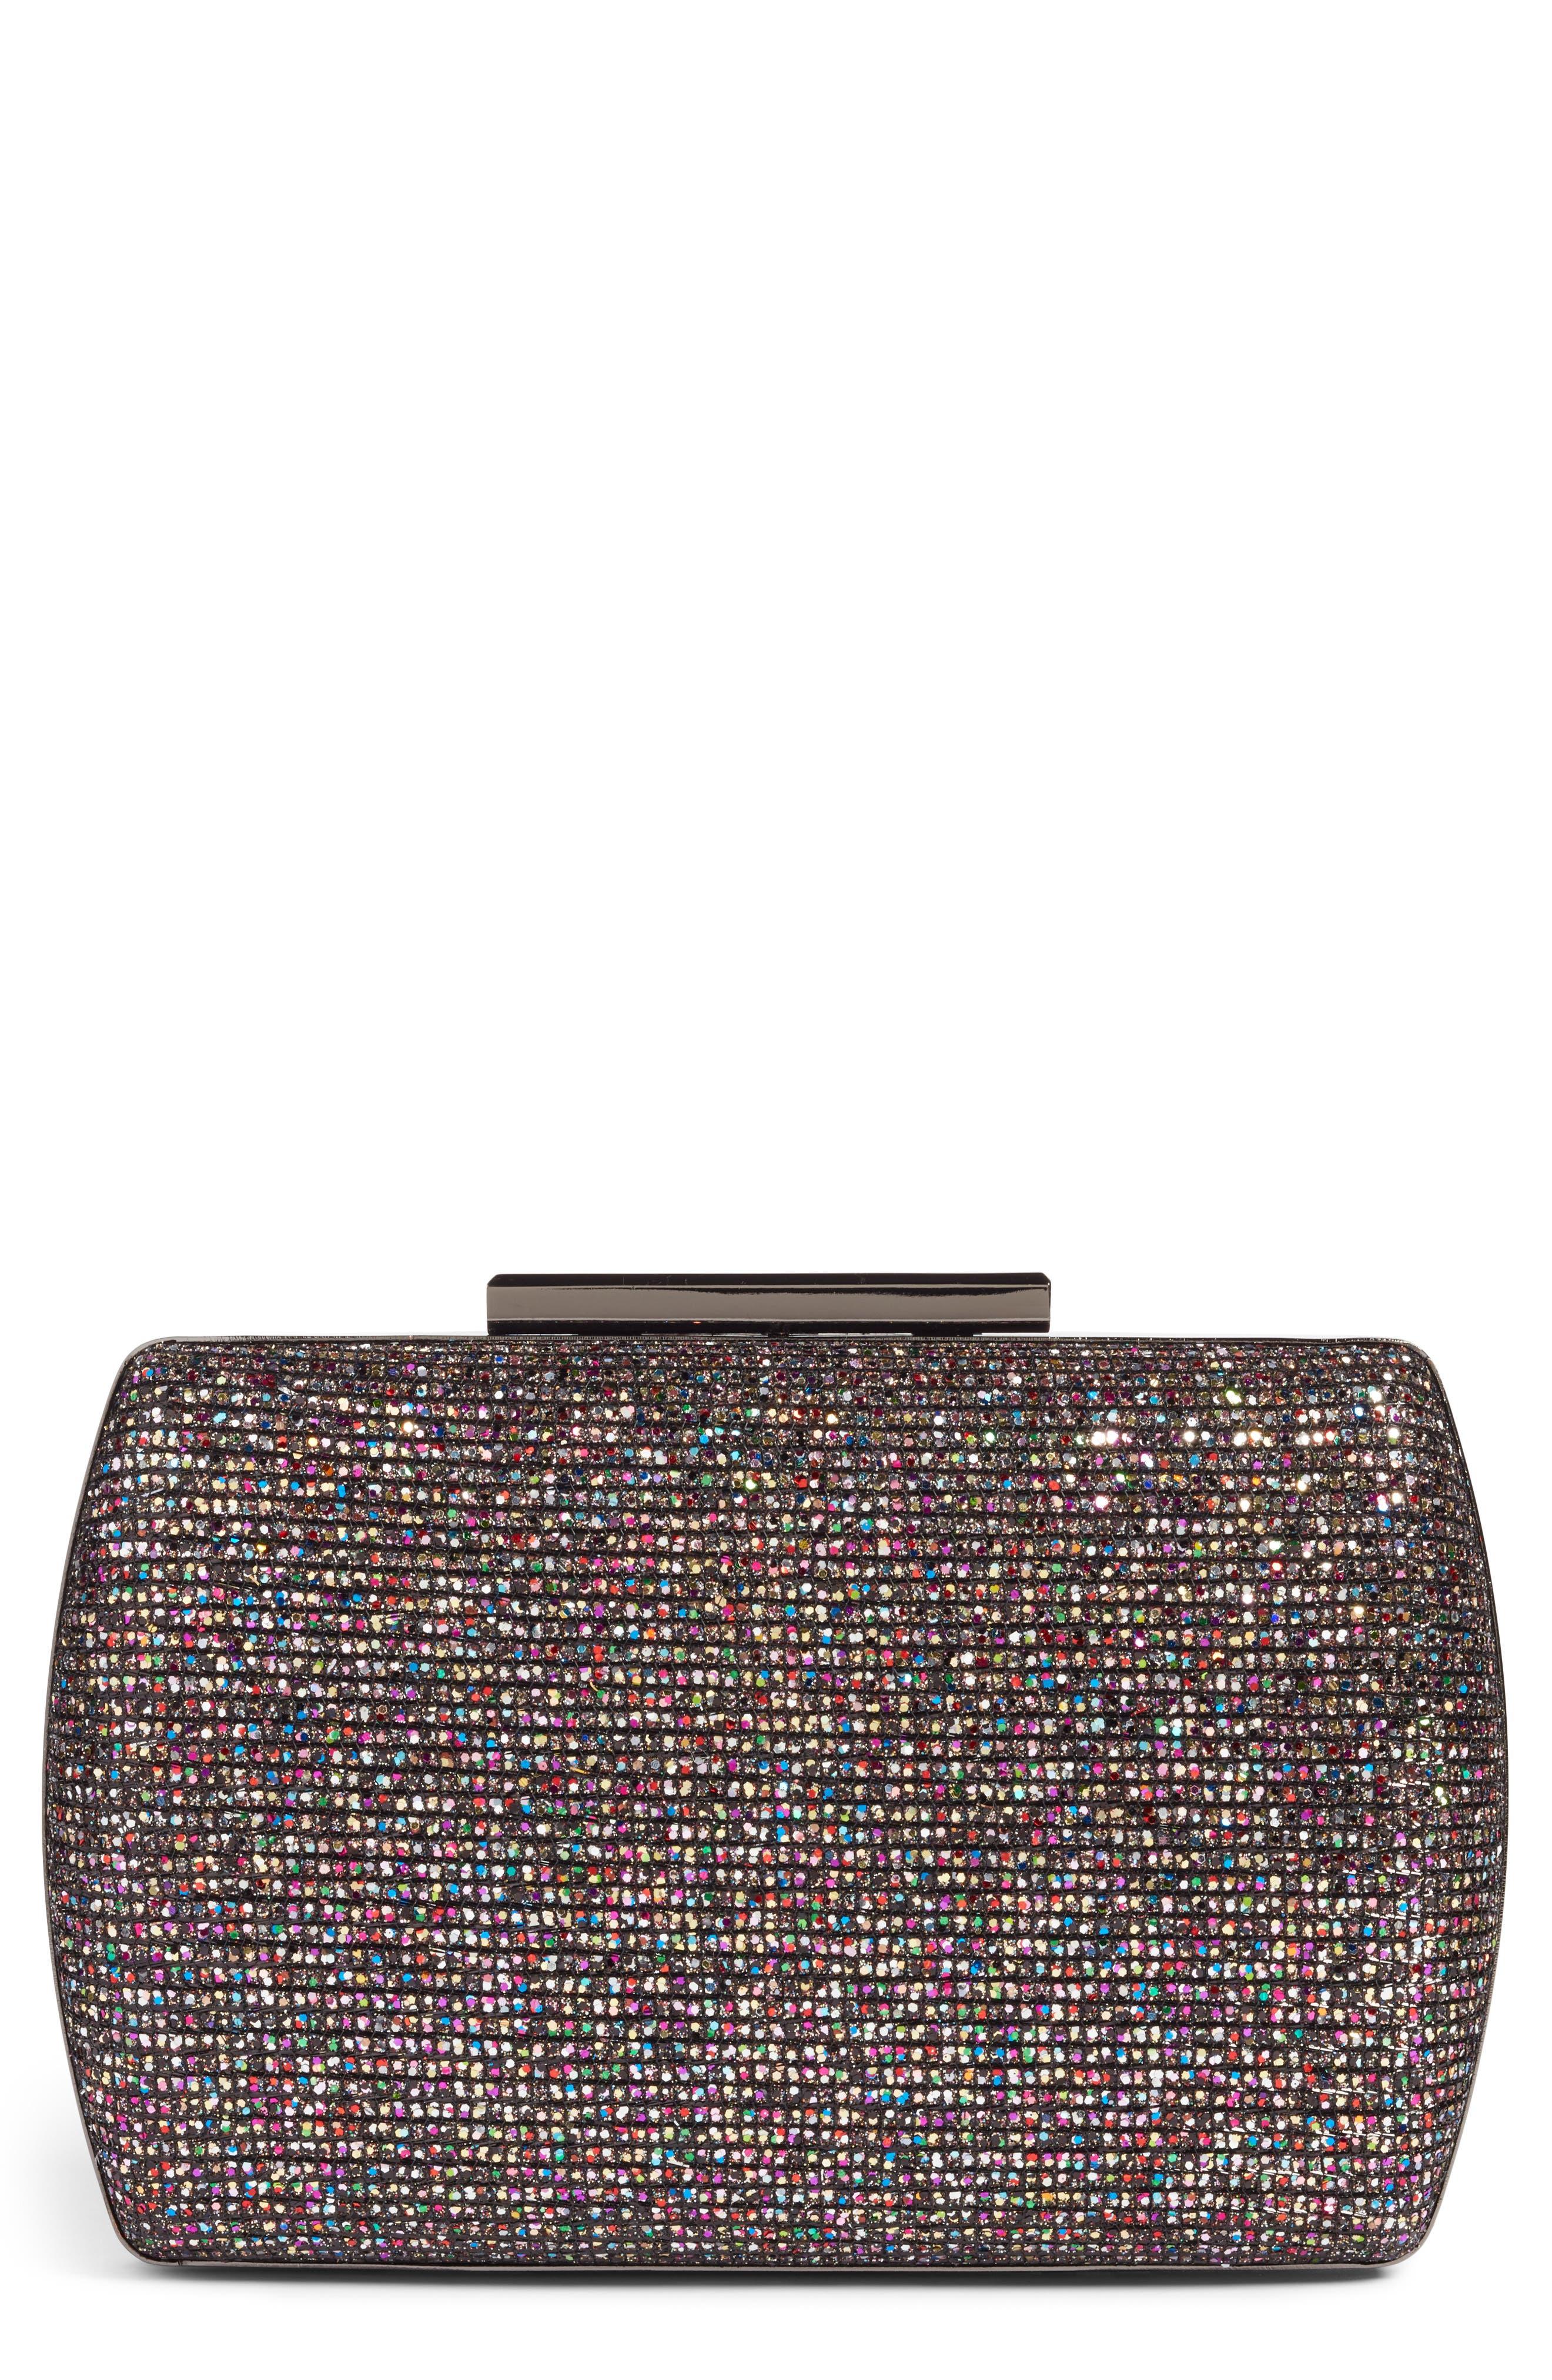 Glitter Minaudière,                         Main,                         color, Black Multi